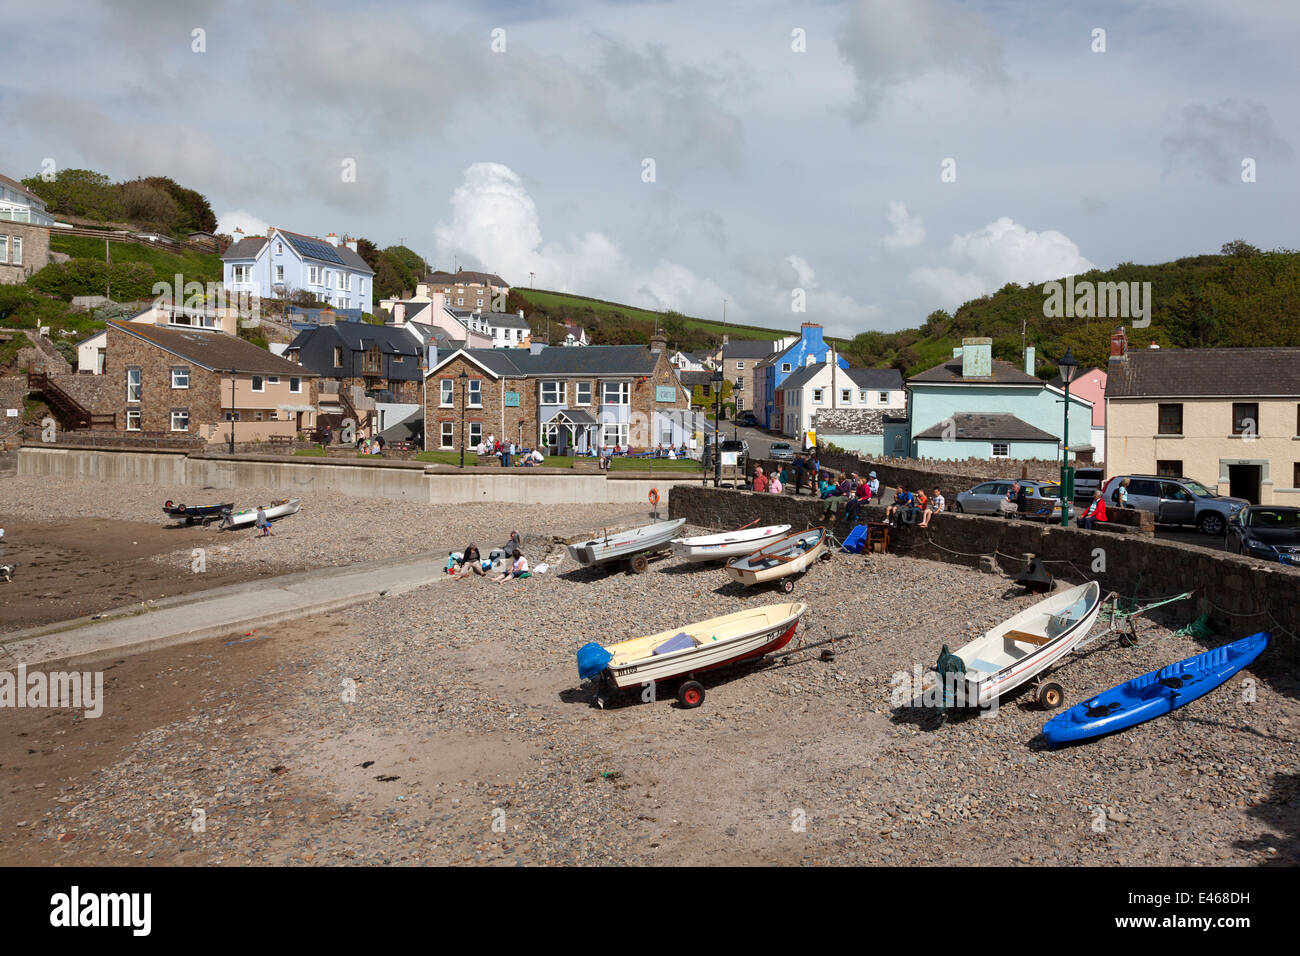 The harbour, Little Haven, Pembrokeshire - Stock Image